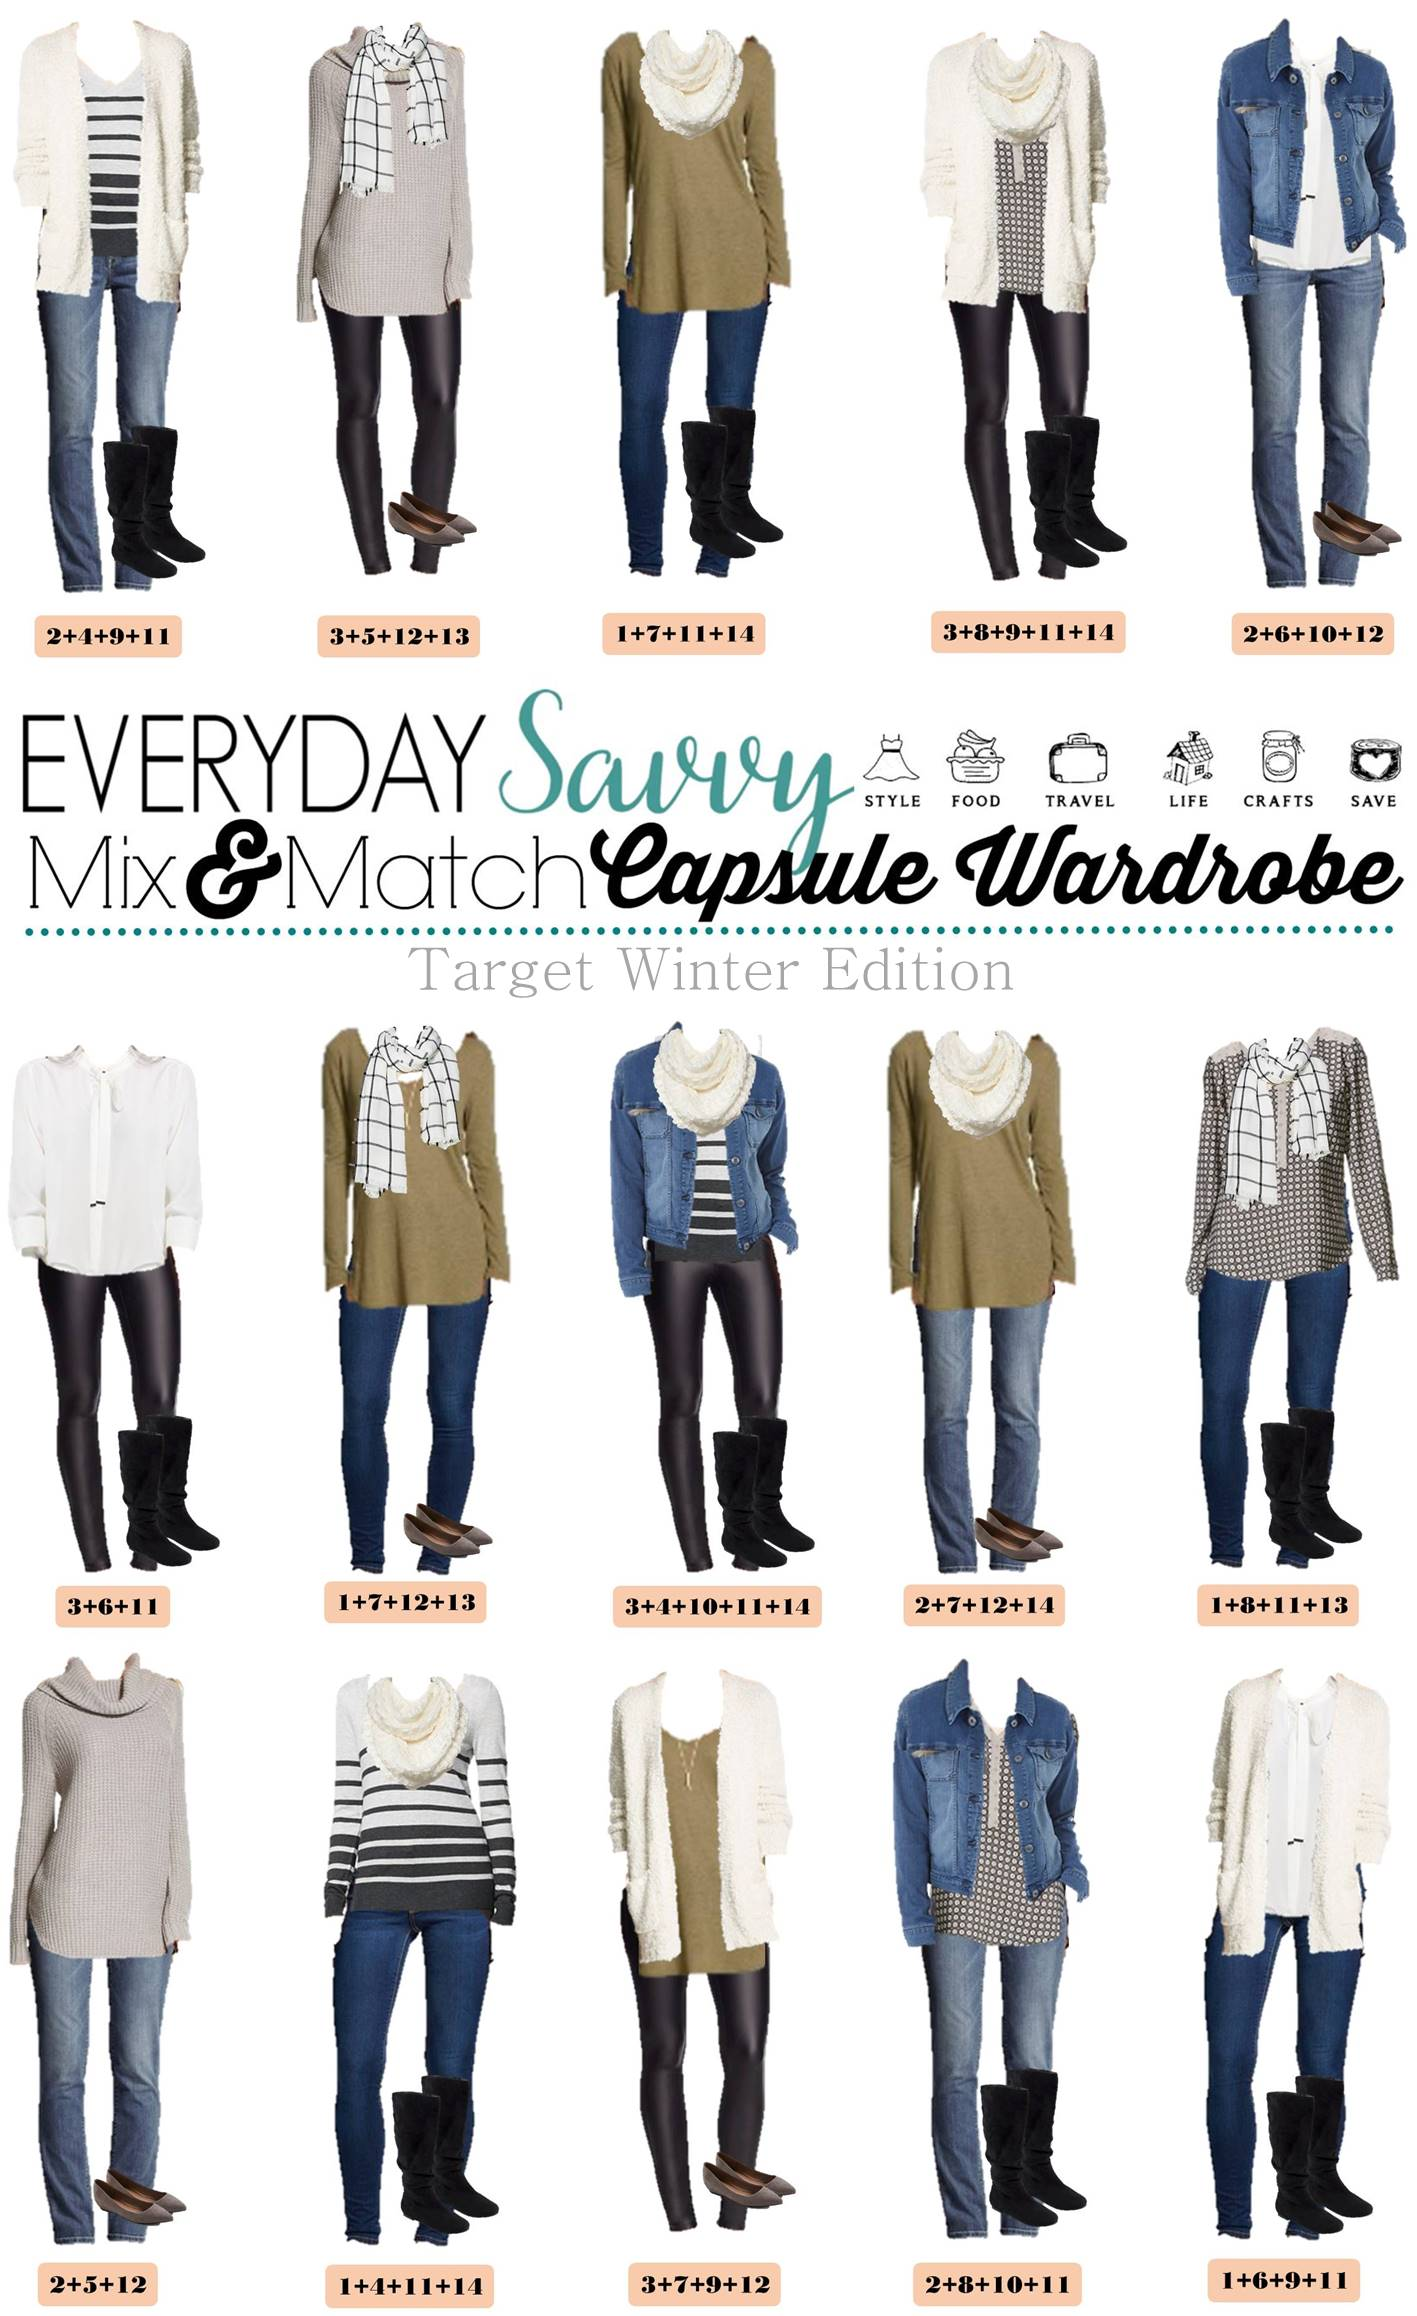 Tar Winter Capsule Wardrobe Mix and Match Everyday Savvy